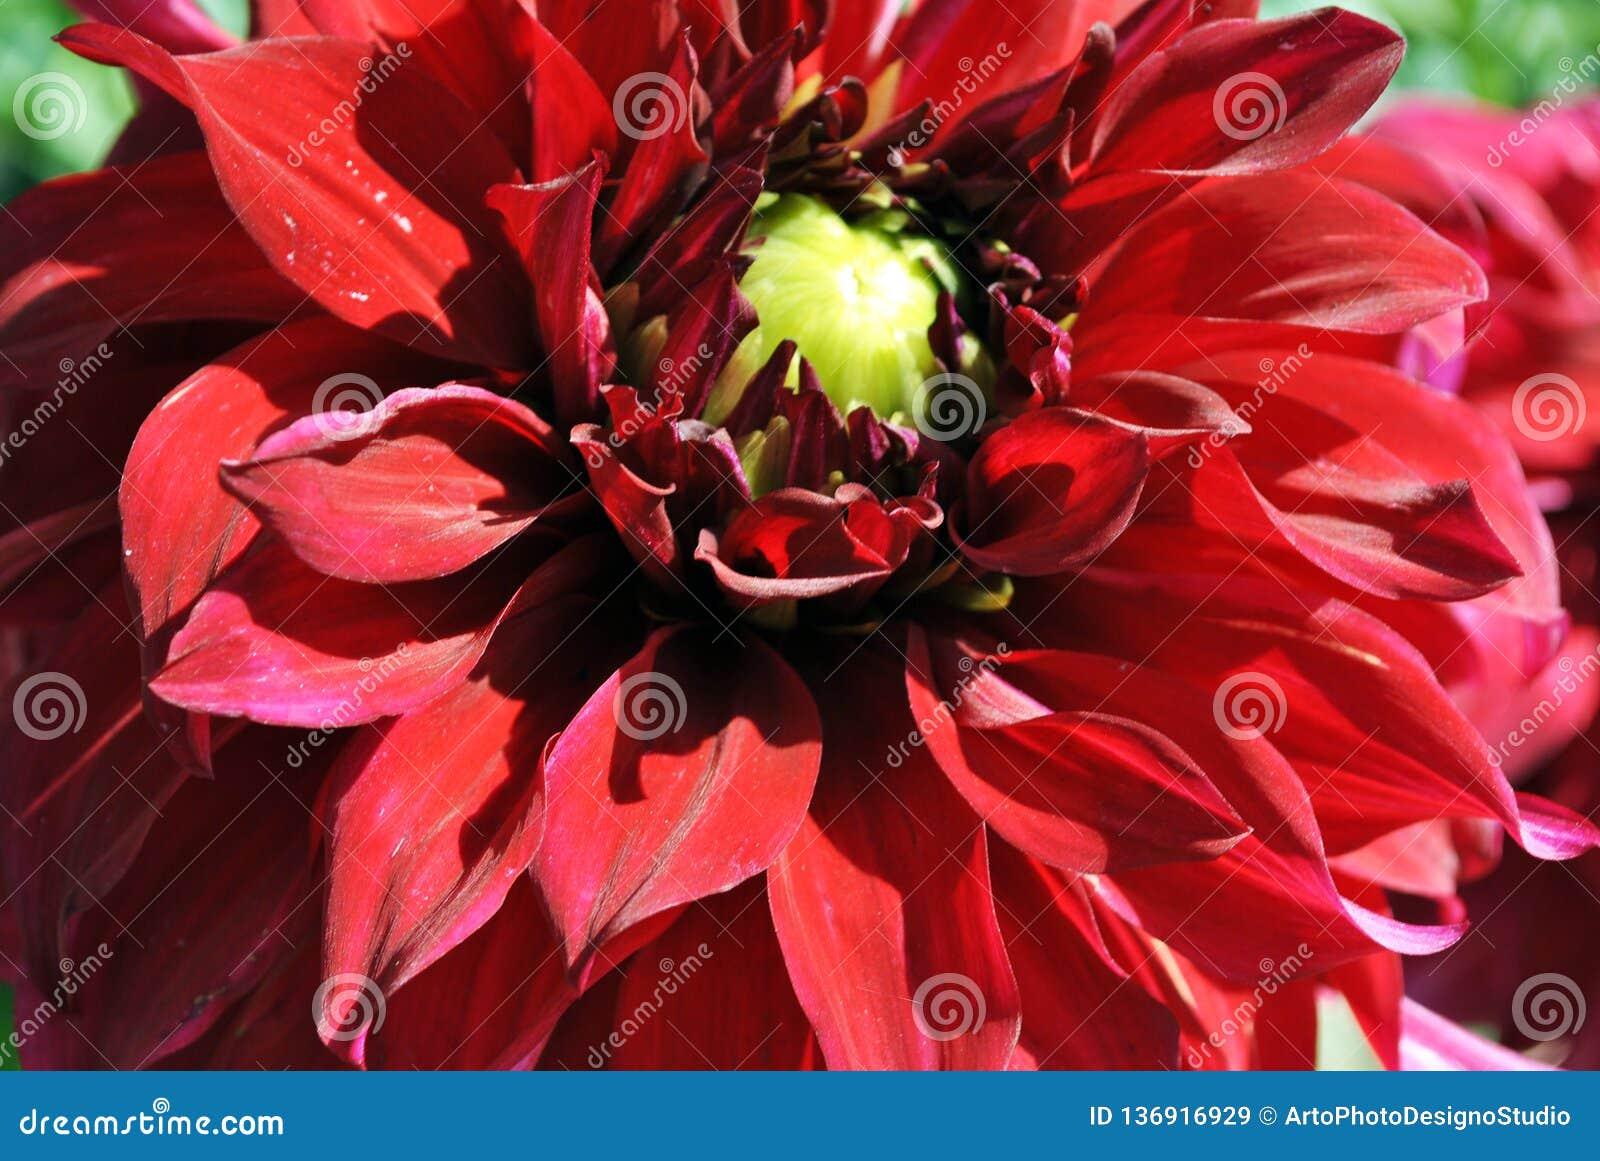 Bright red dahlias on green bush, petals close up detail, soft blurry bokeh